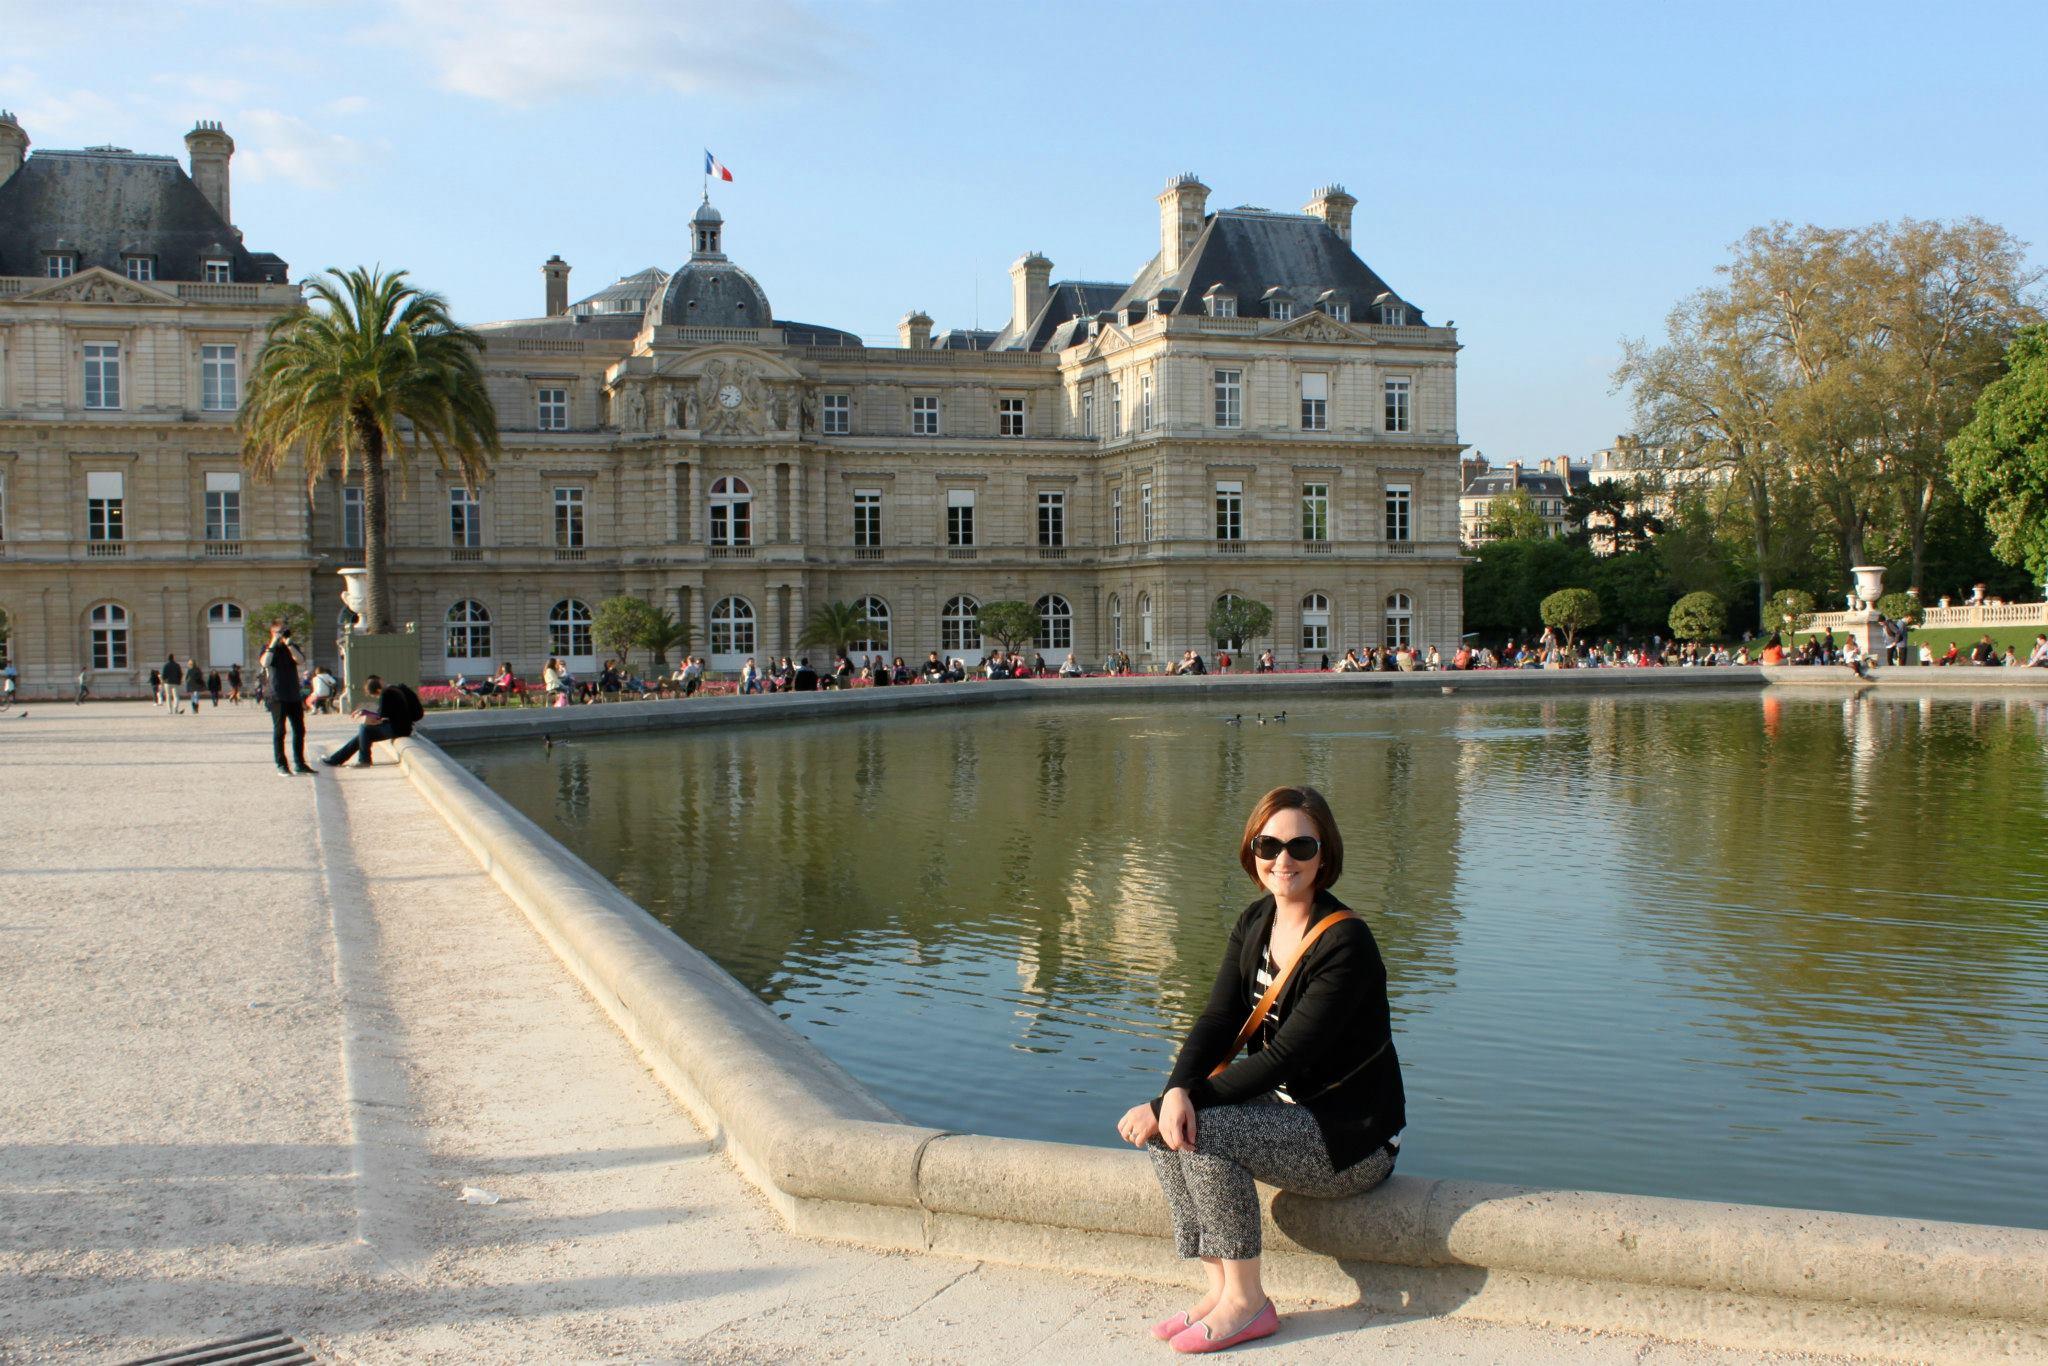 My trip to Paris in 2013